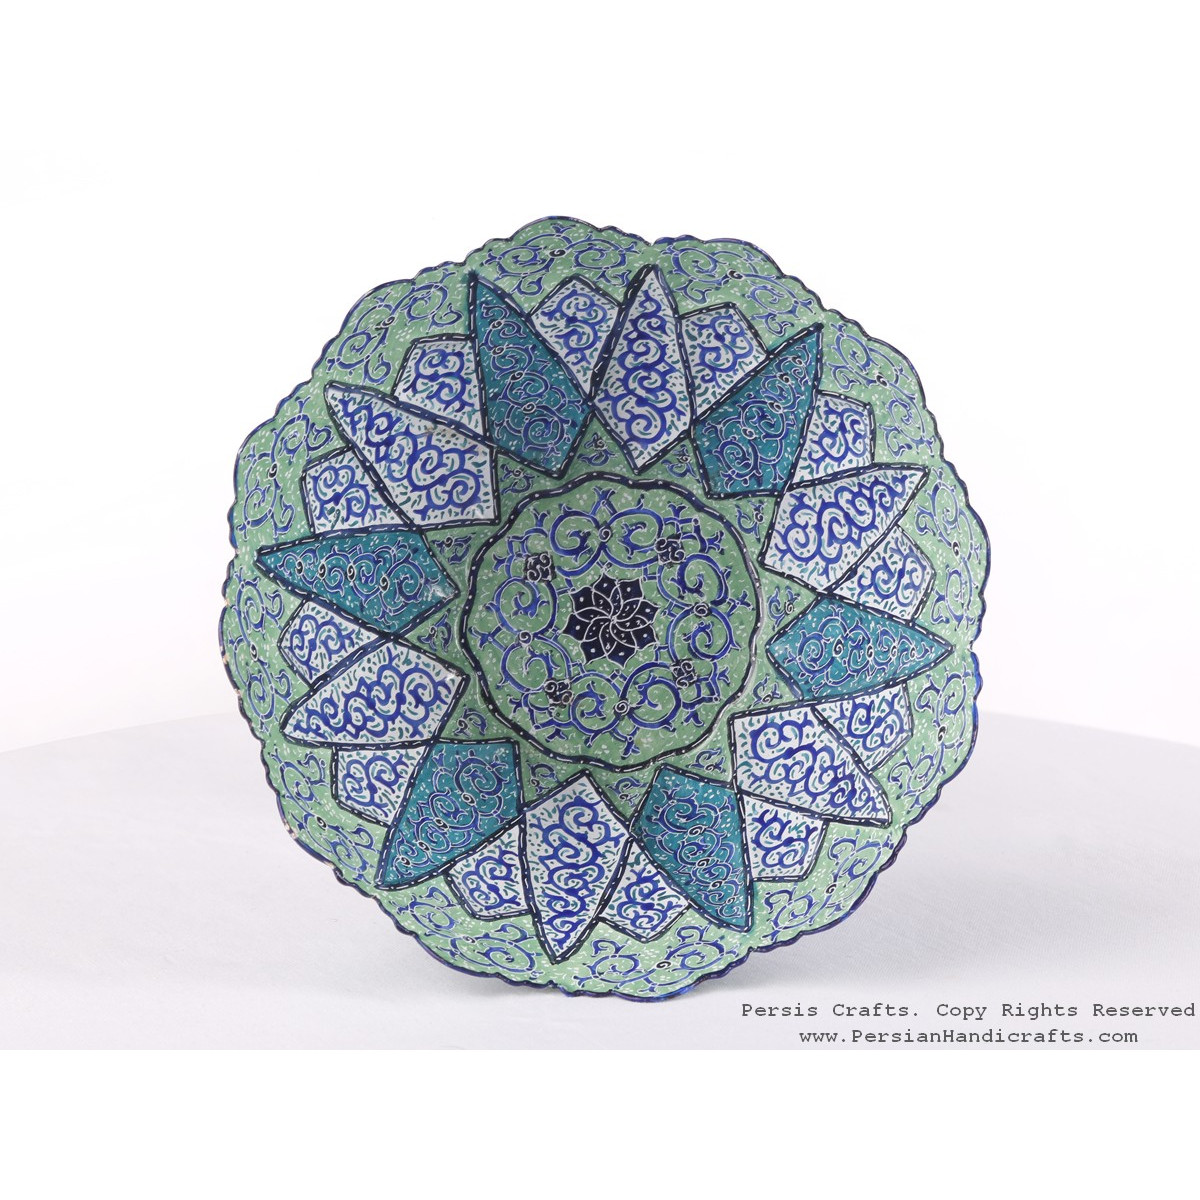 Enamel (Minakari) Pedestal Compote Candy Dish - HE3608-Persian Handicrafts